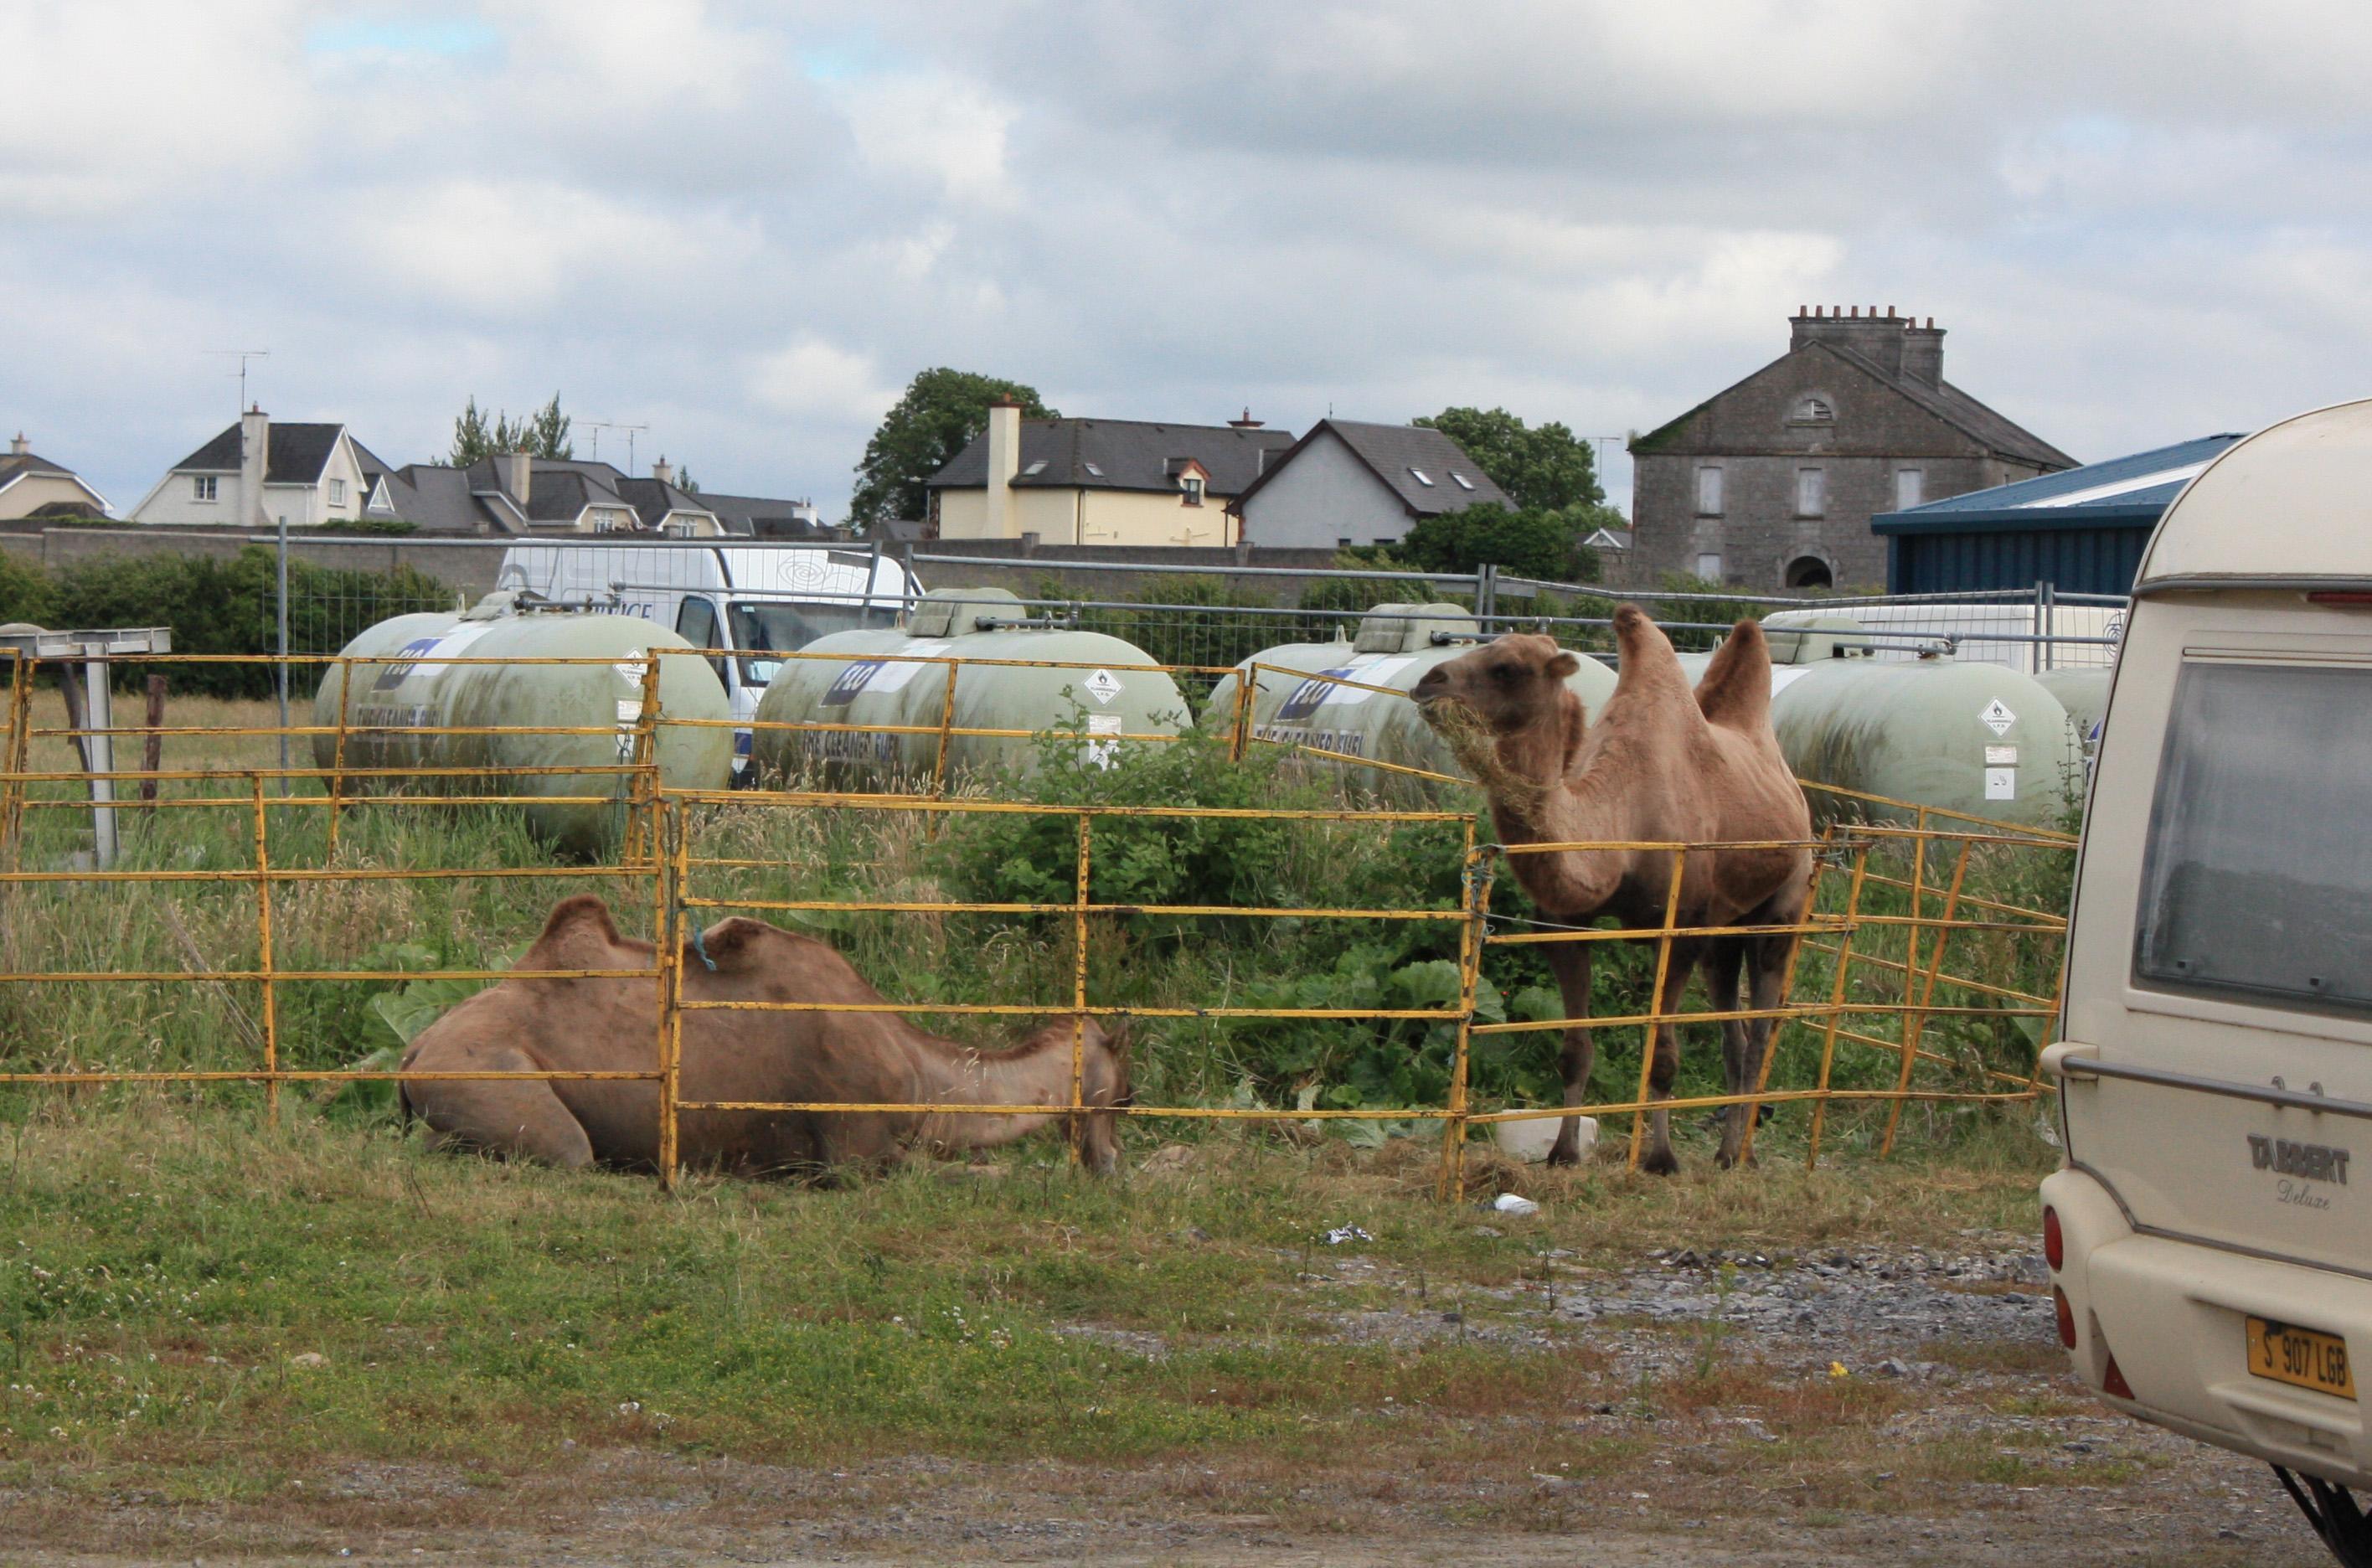 courtneys camels 12